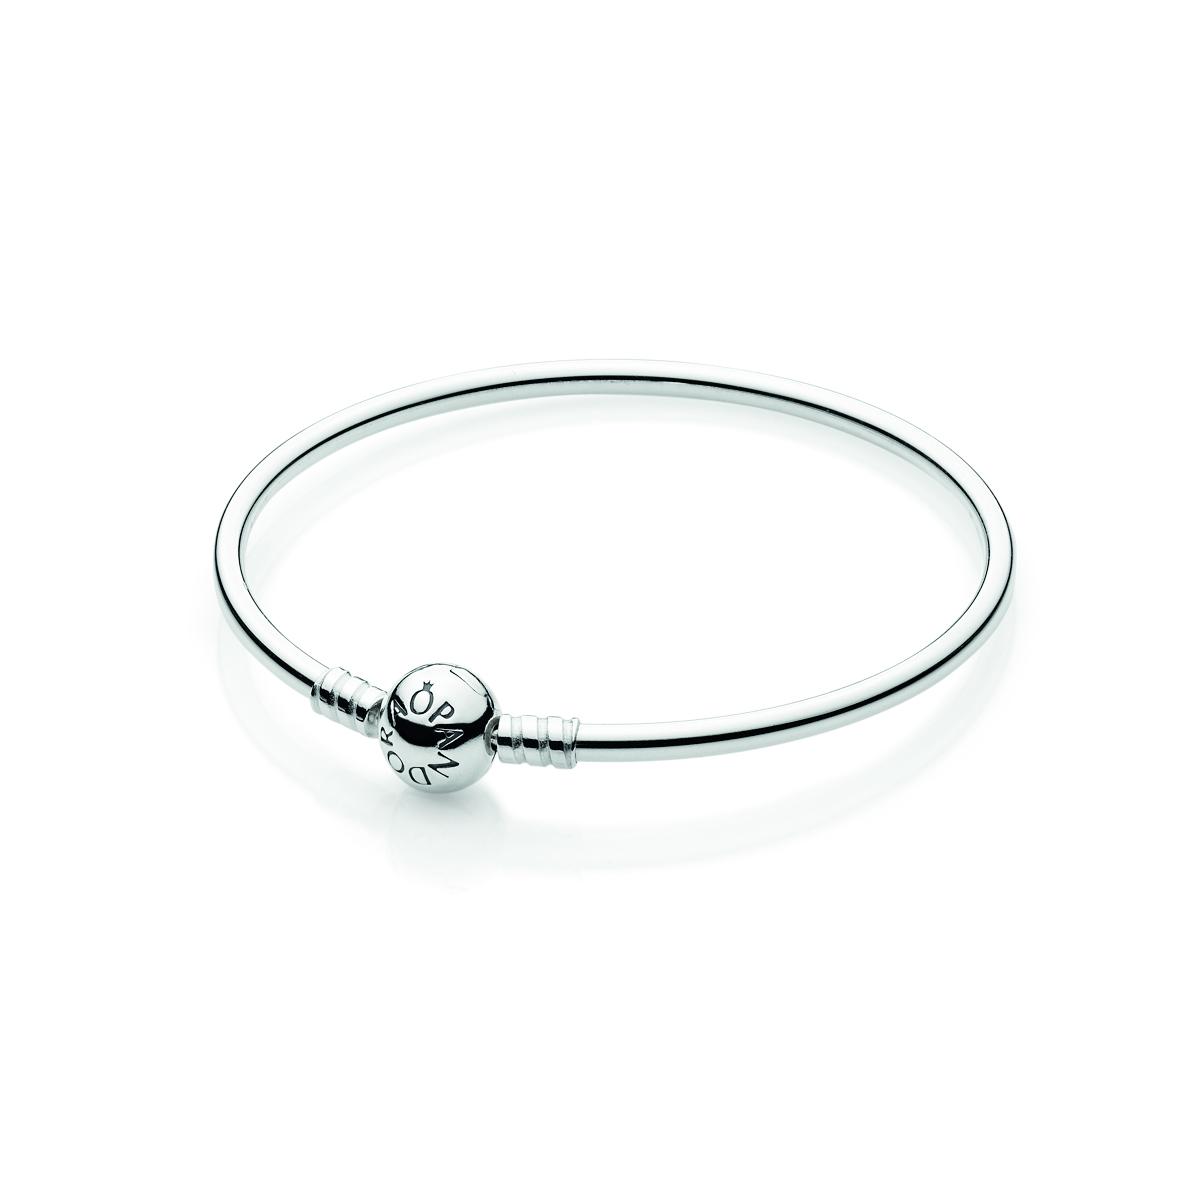 new Pandora silver bangle - neuer Silberarmreif 2013